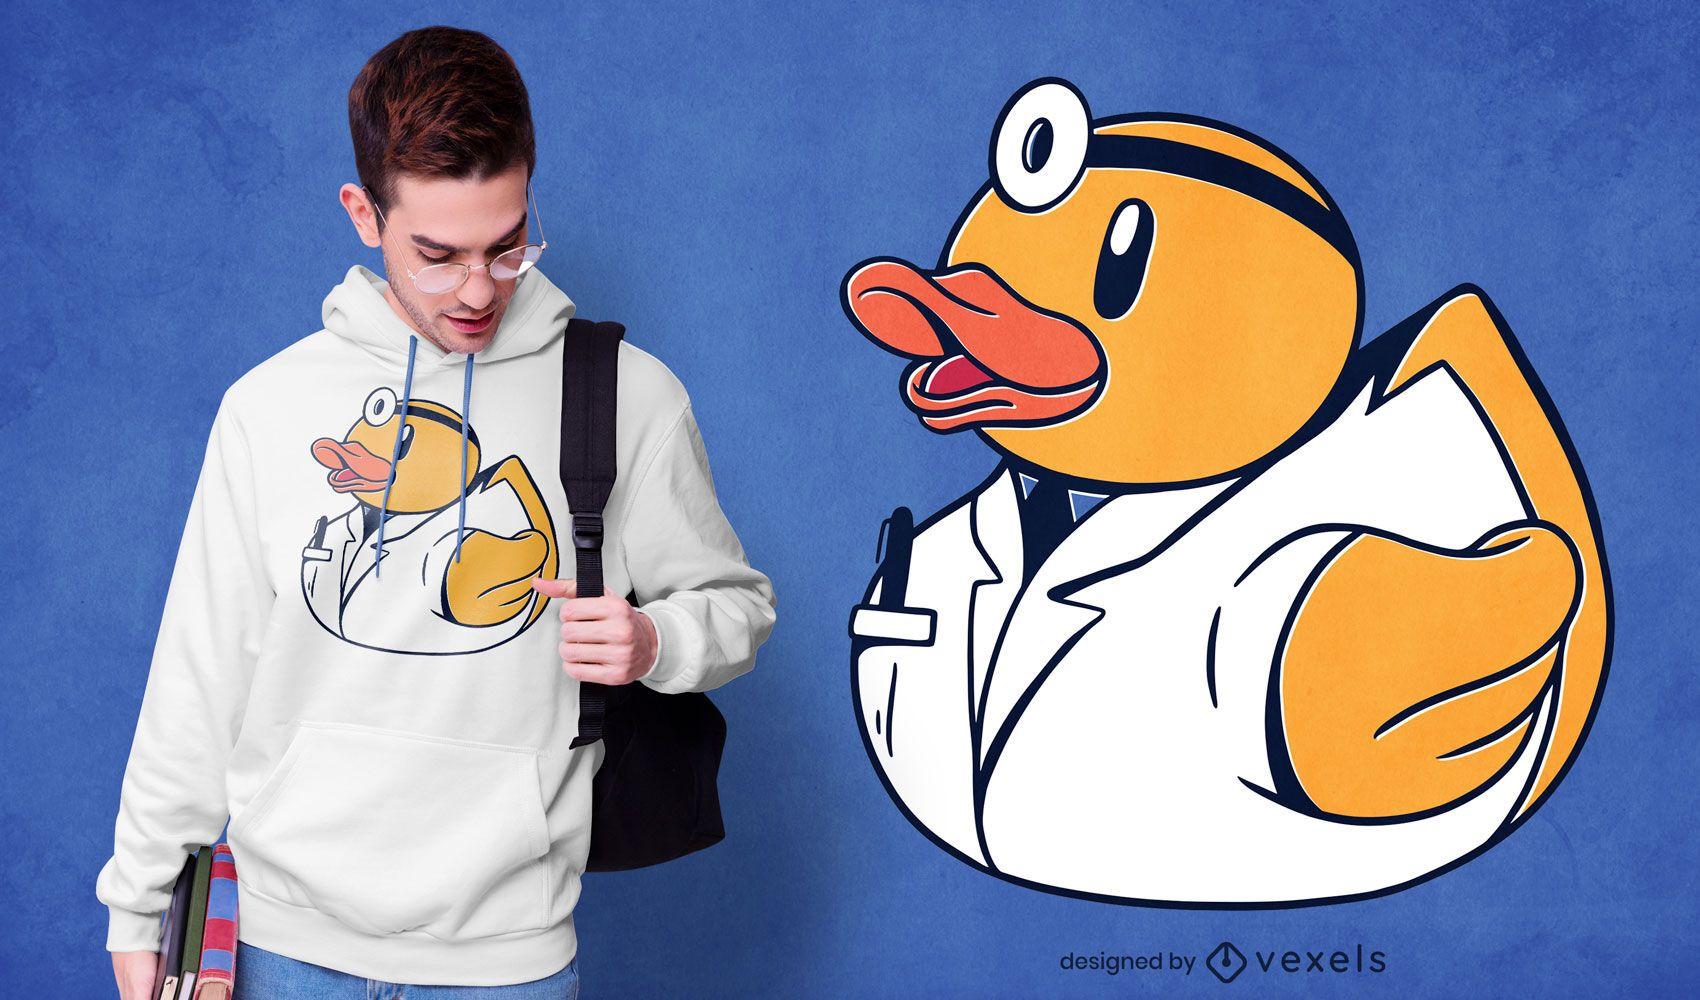 Diseño de camiseta Dr. Rubber Duck